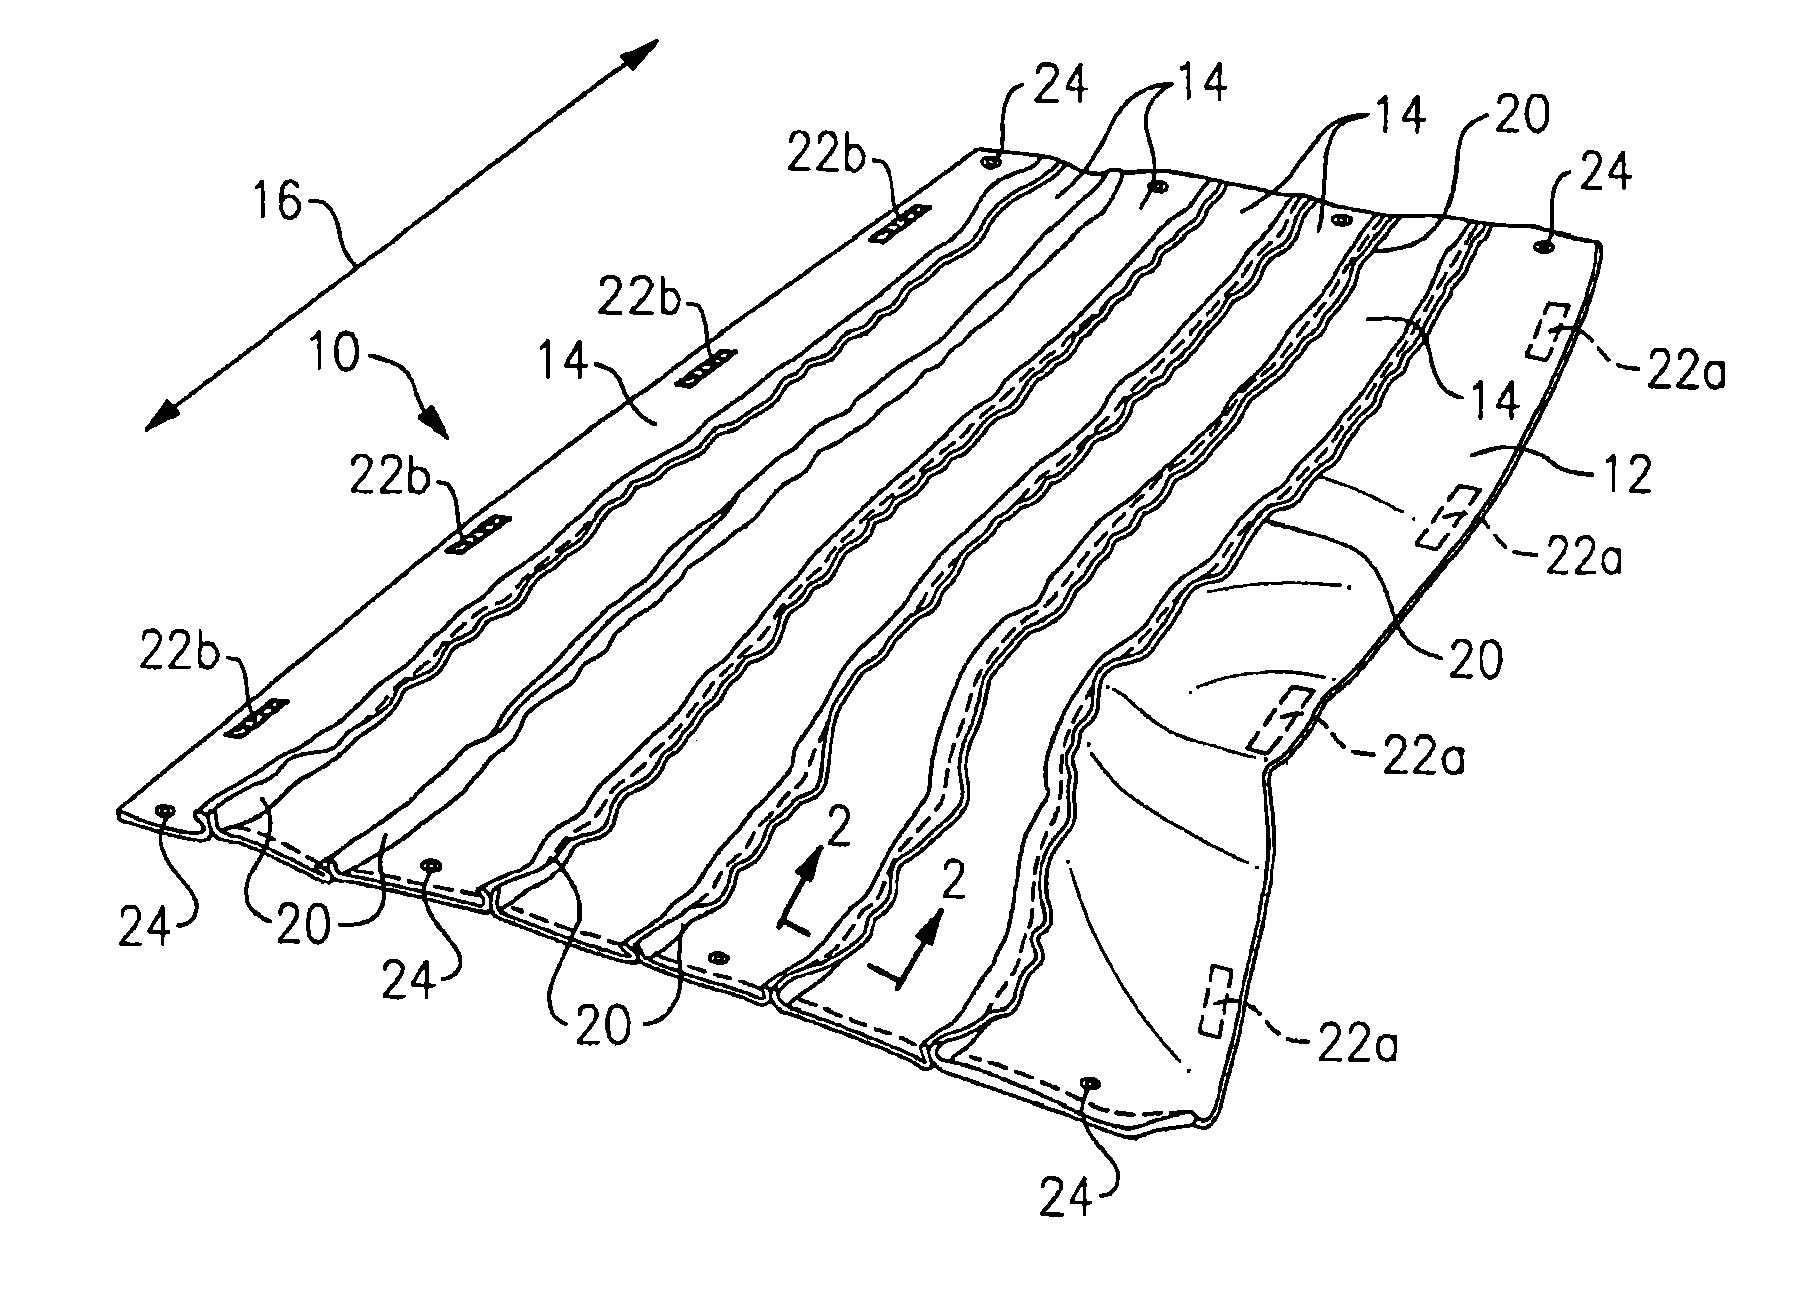 400w hps ballast wiring diagram images light ballast wiring 150w hps ballast wiring diagram together 400w